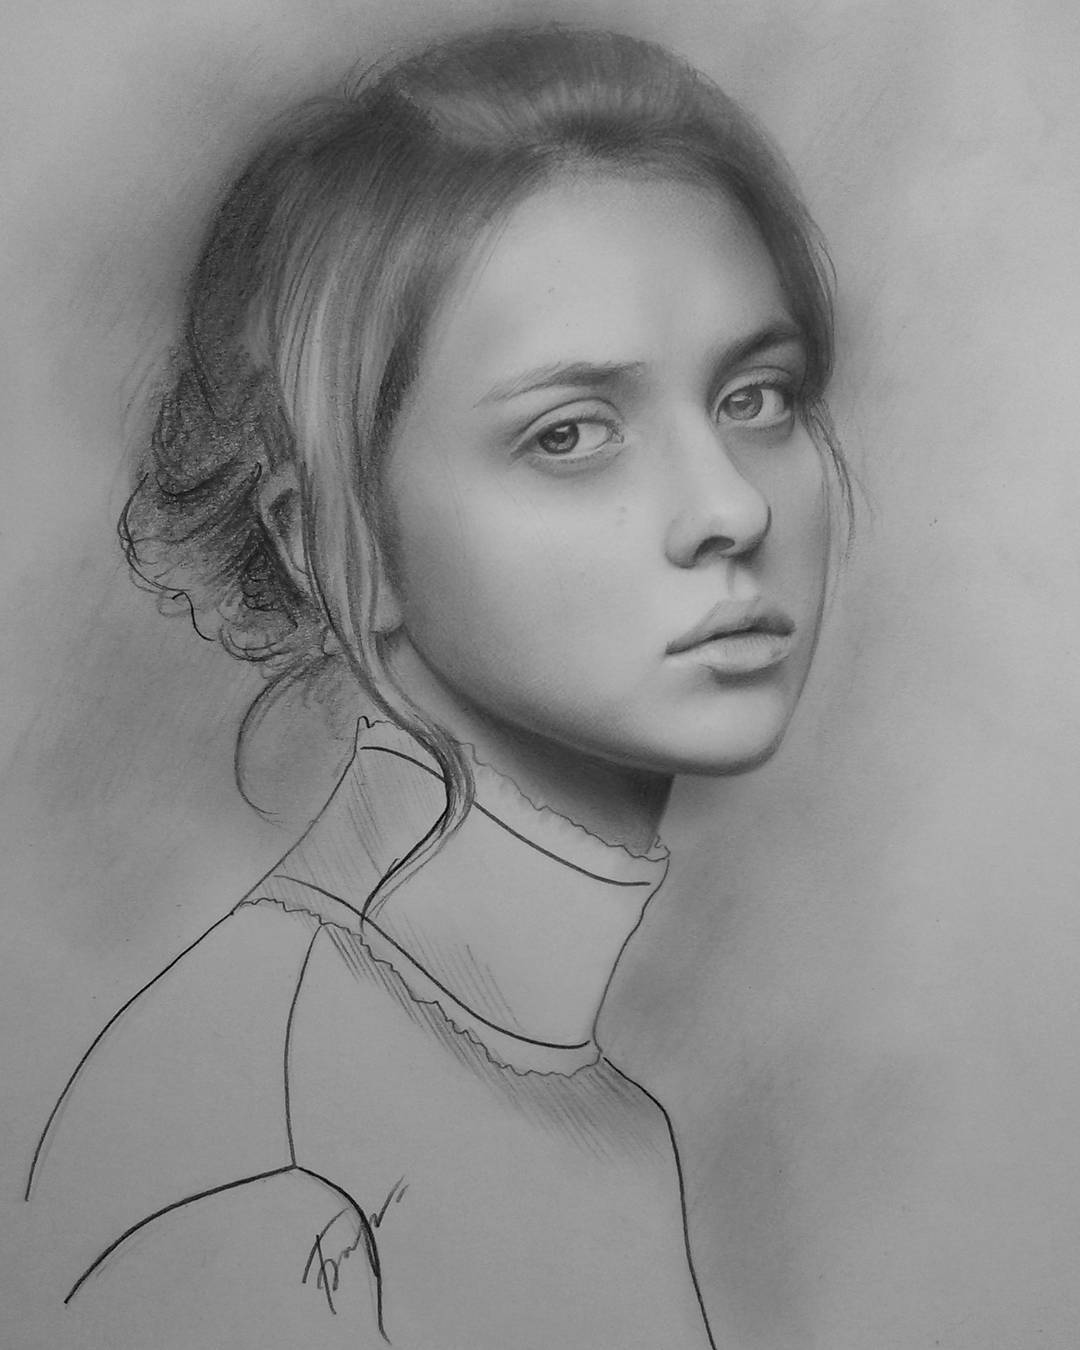 9 woman portrait pencil drawings by vita biryulina